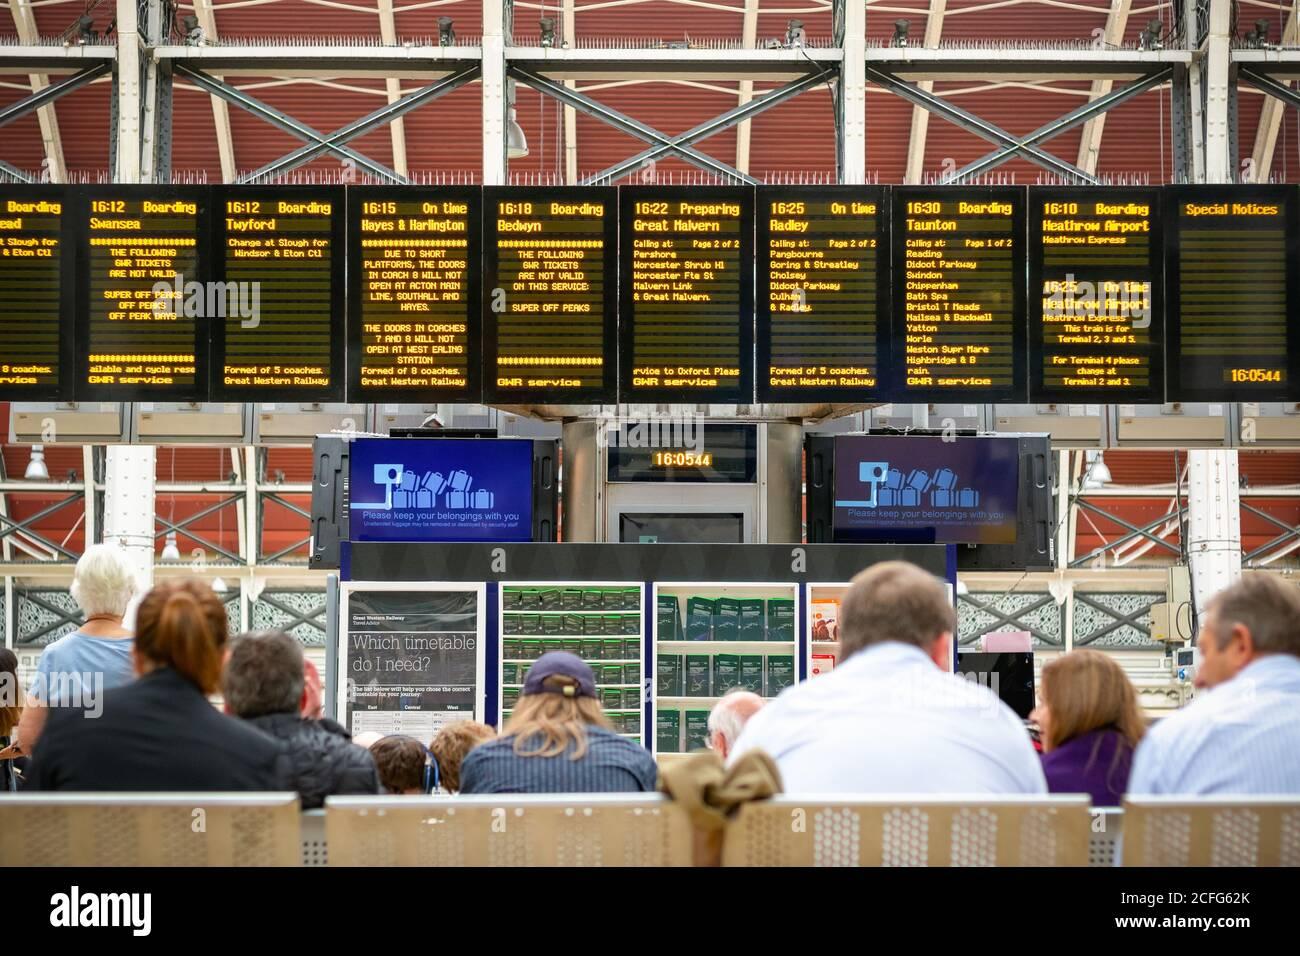 Unrecognised passengers checking train timetable at London Paddington railway station Stock Photo